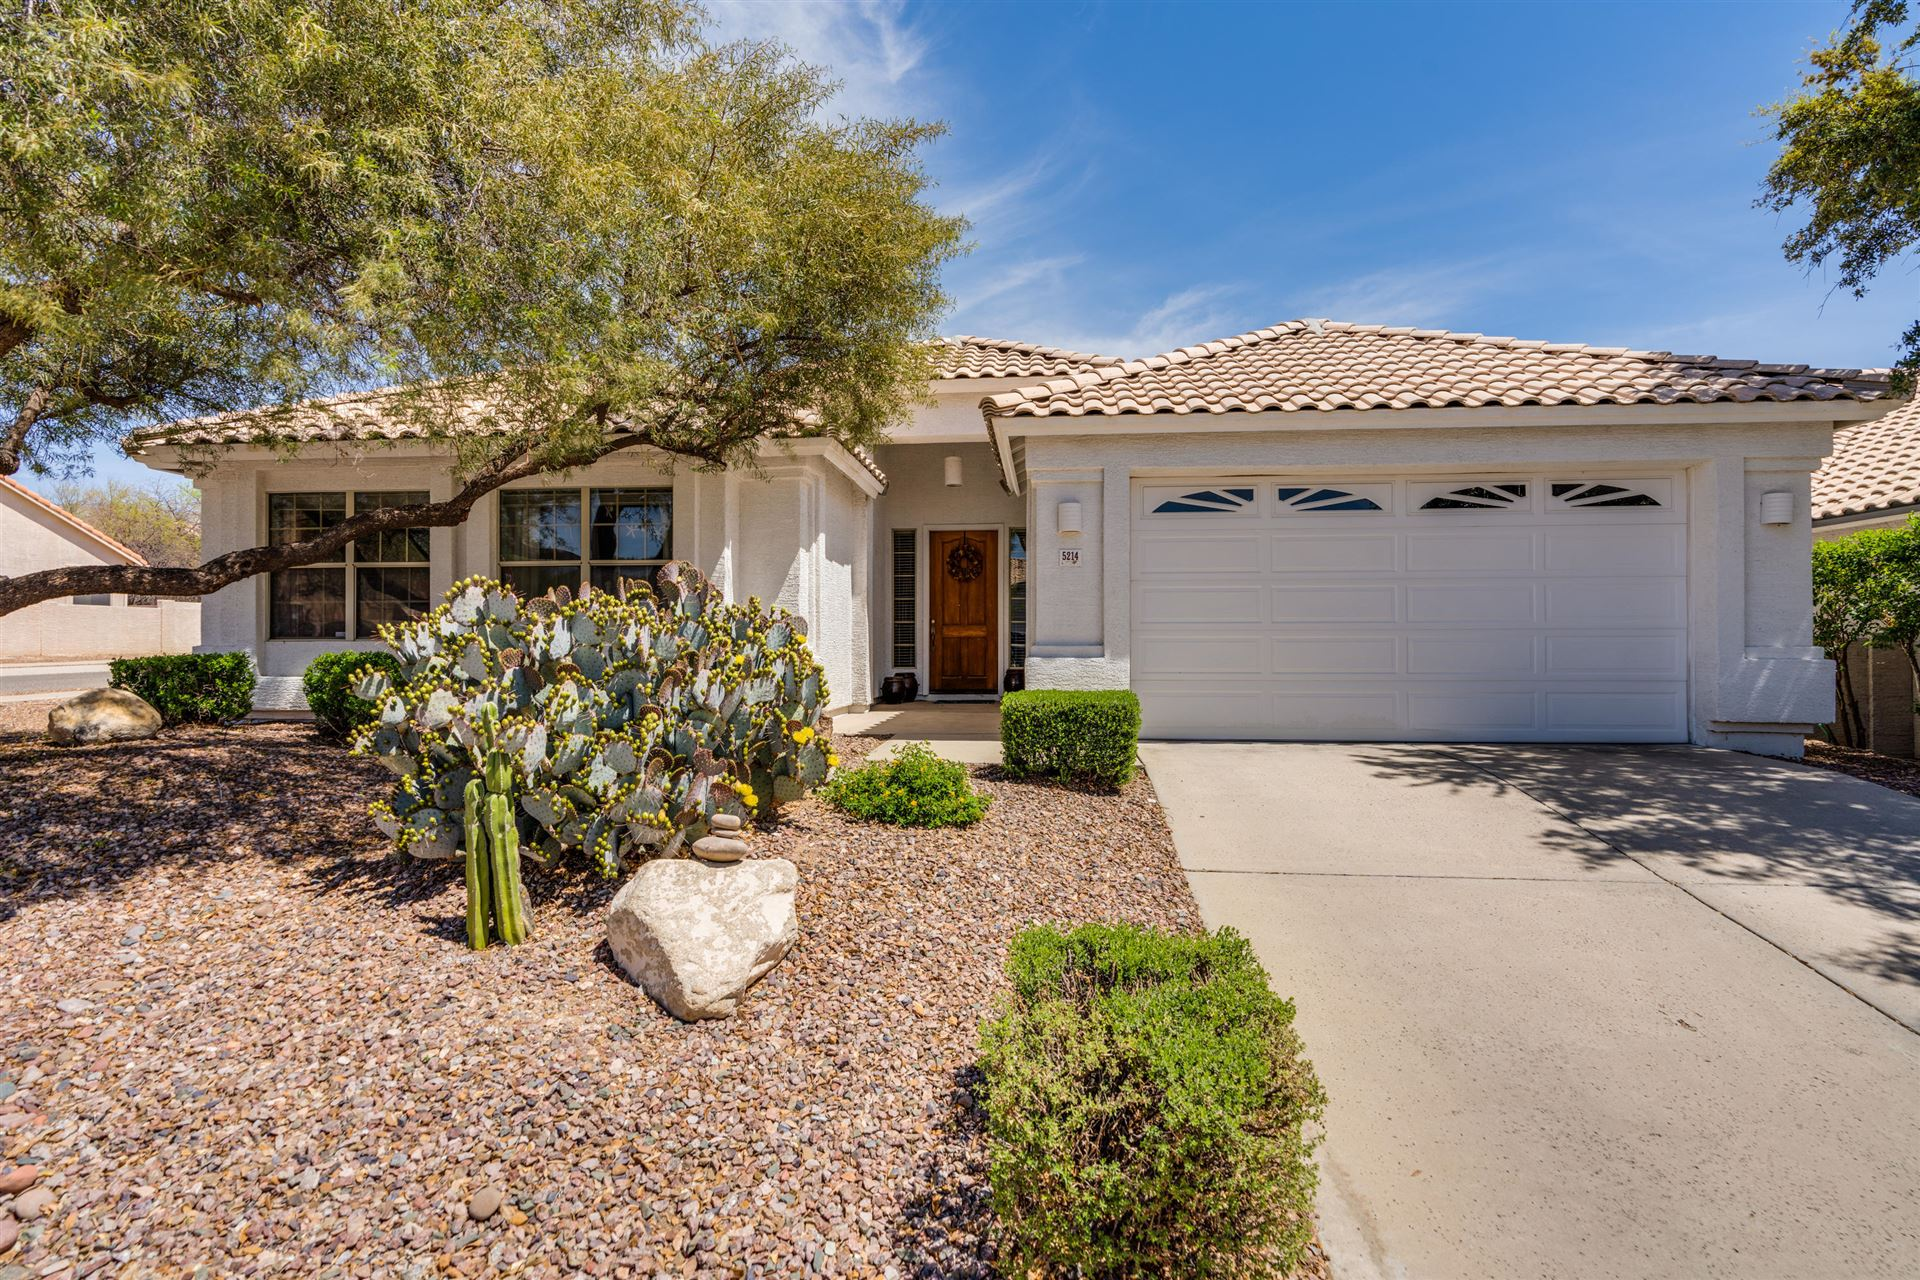 5214 N Via La Heroina, Tucson, AZ 85750 - MLS#: 22109440